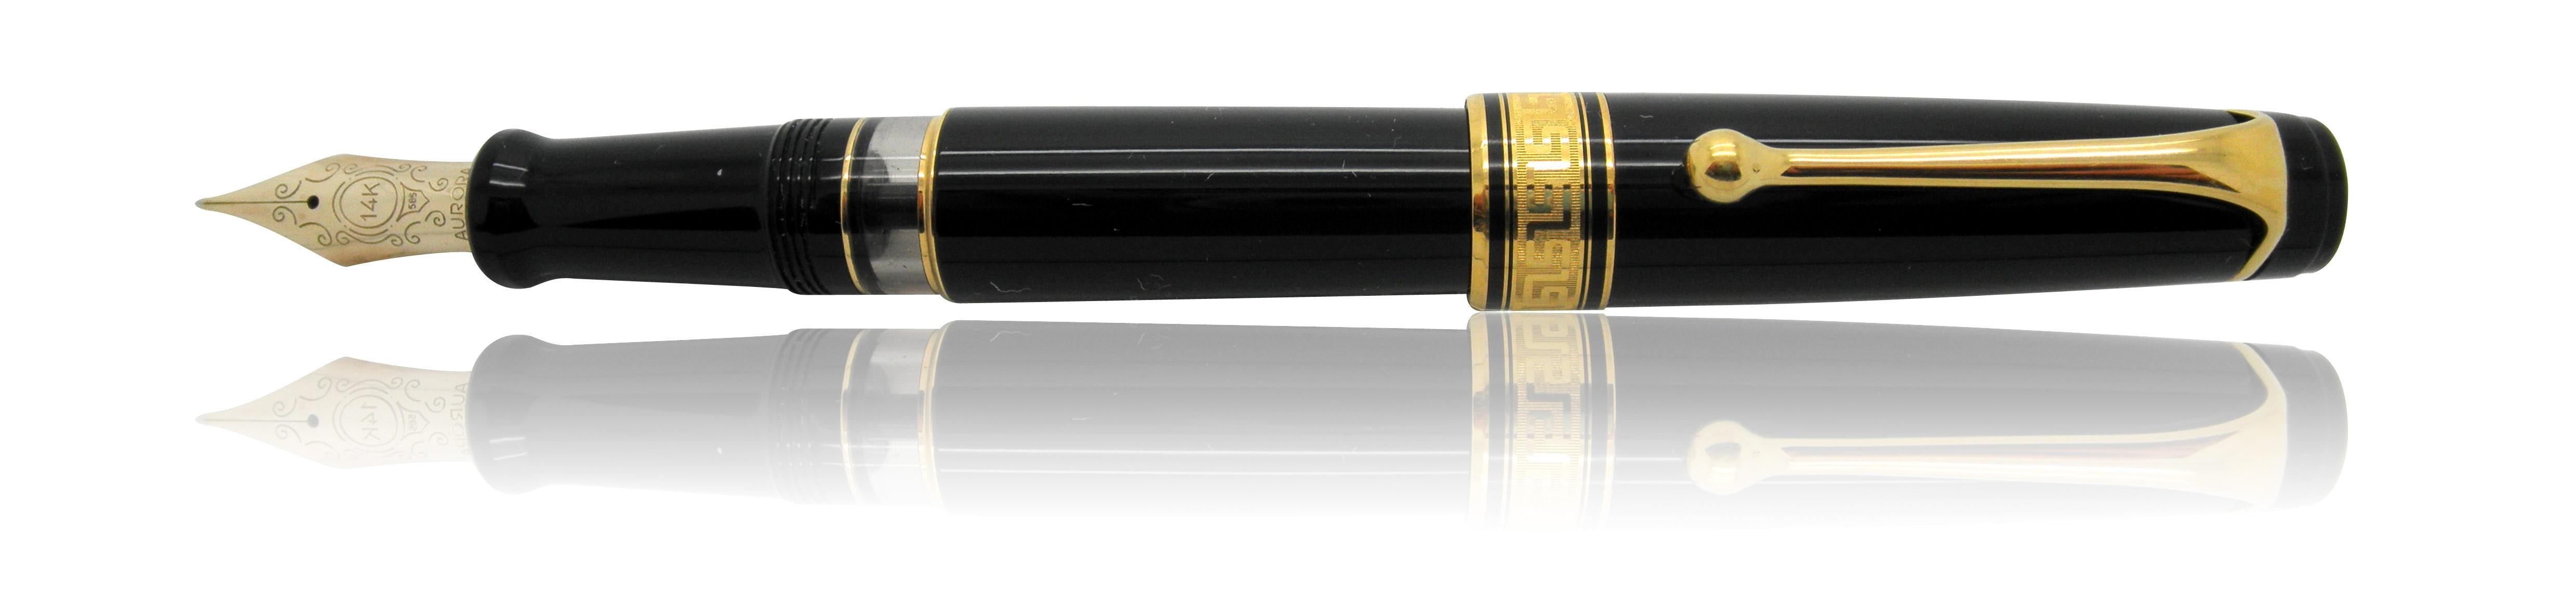 Delta Isaac Newton Limited Edition Fountain Pen